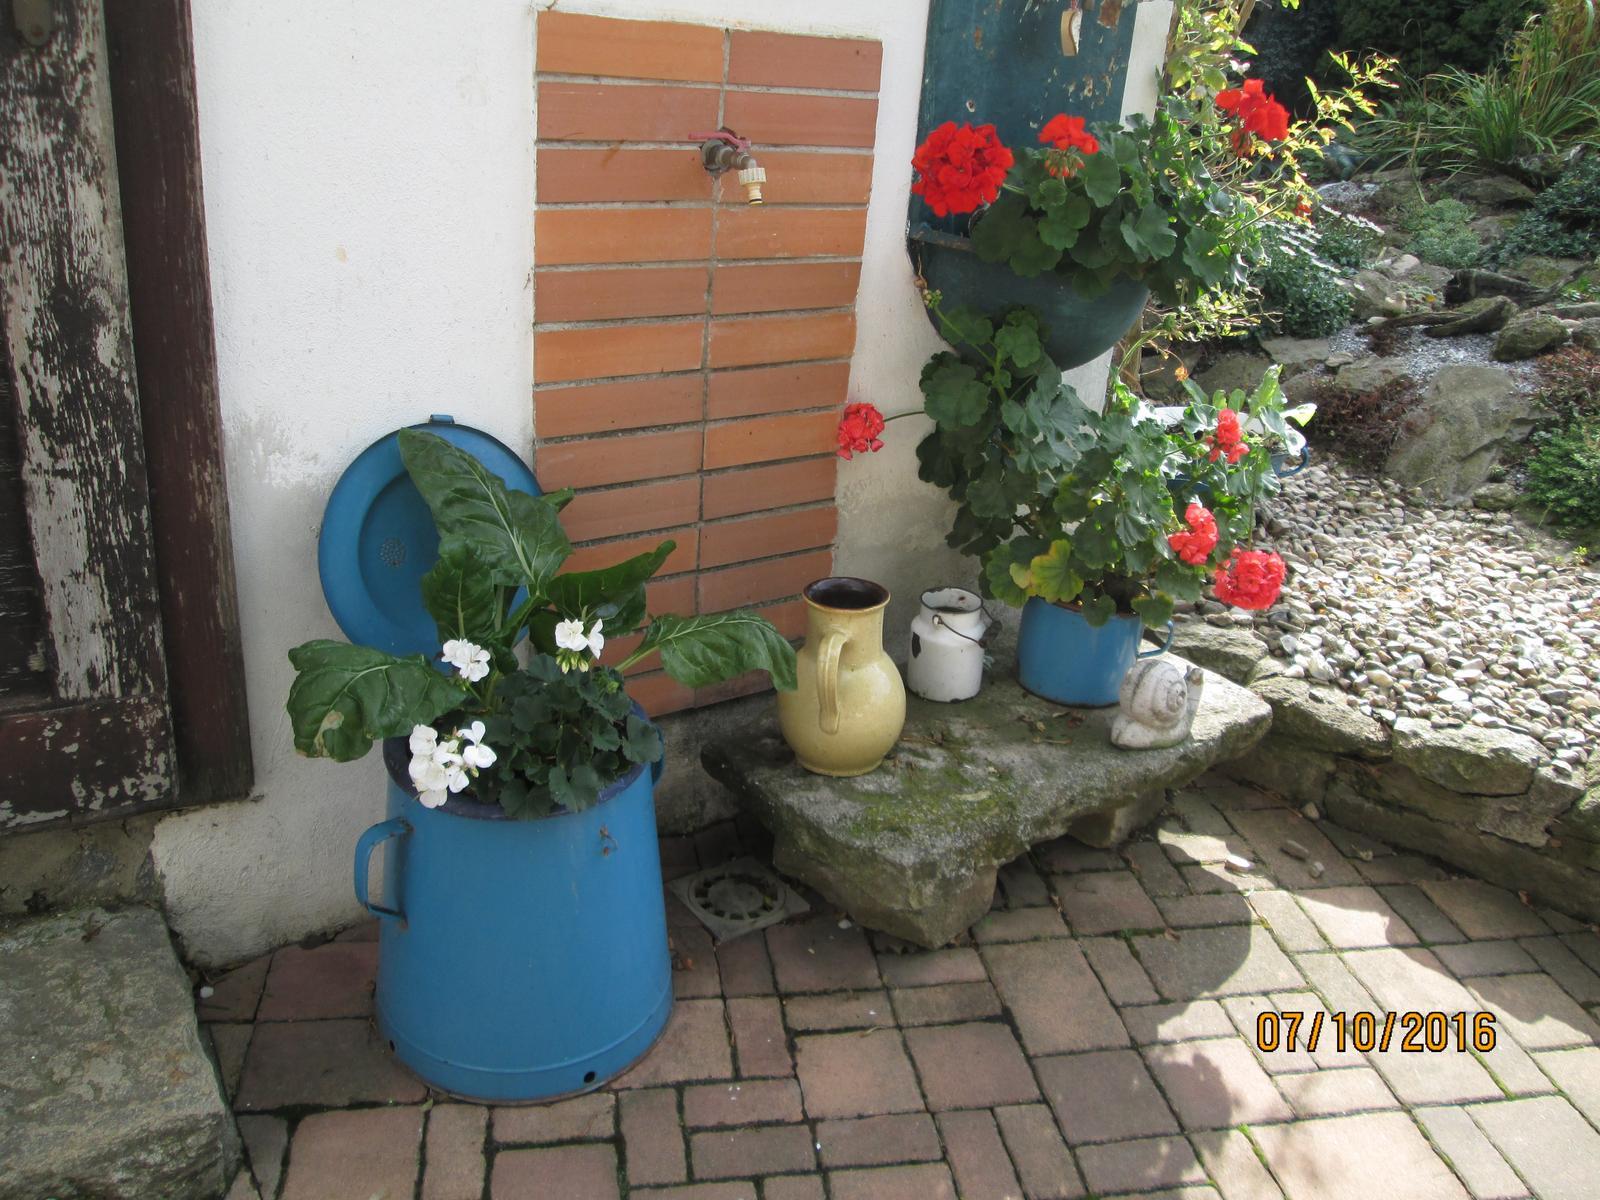 Moje zahrada - Obrázek č. 228